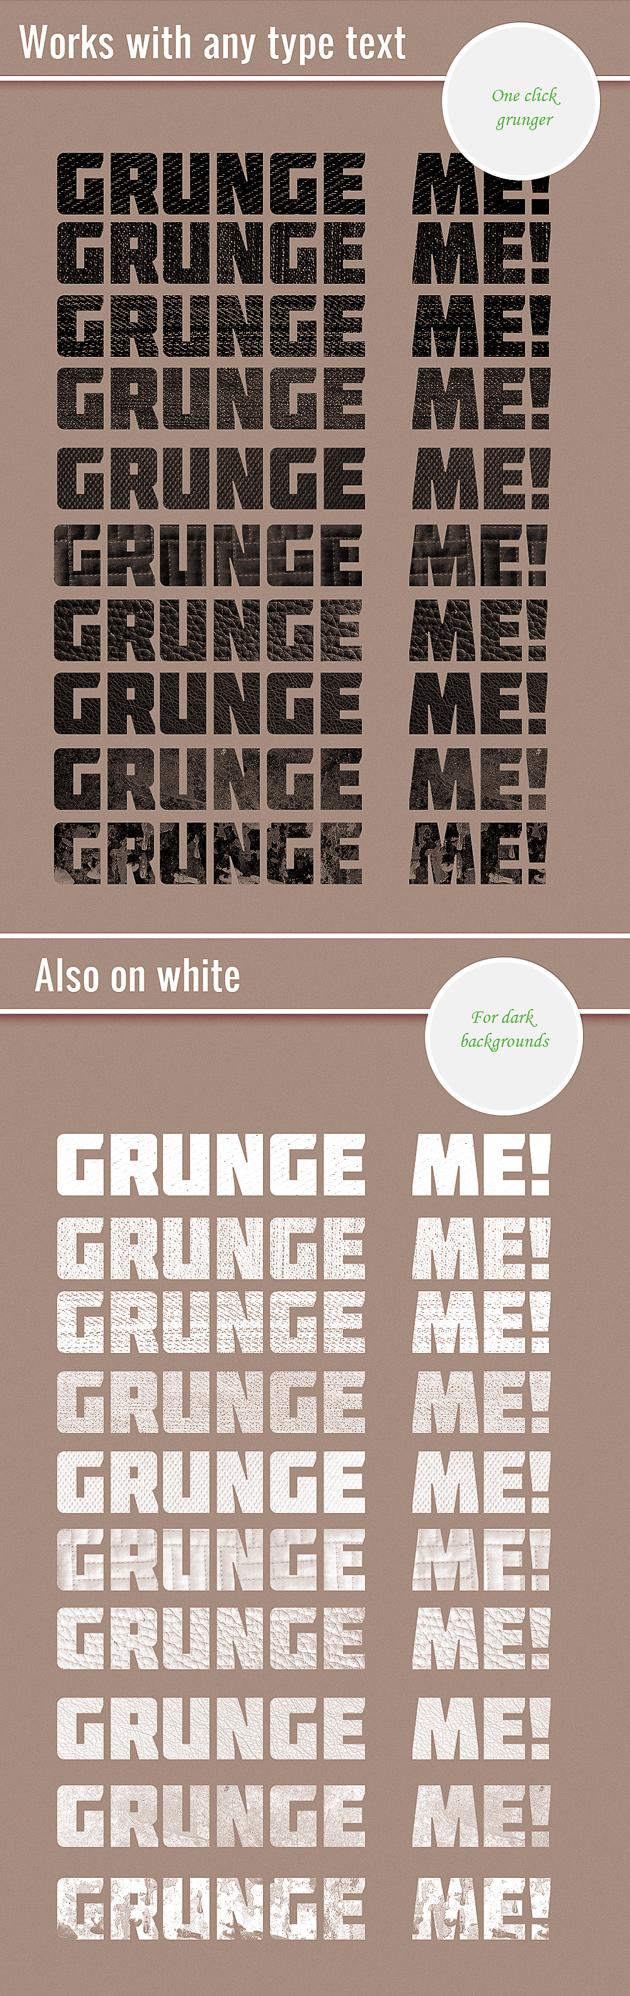 Grunge-Text-Style-Set-3 designtnt adons grunge styles 3 large